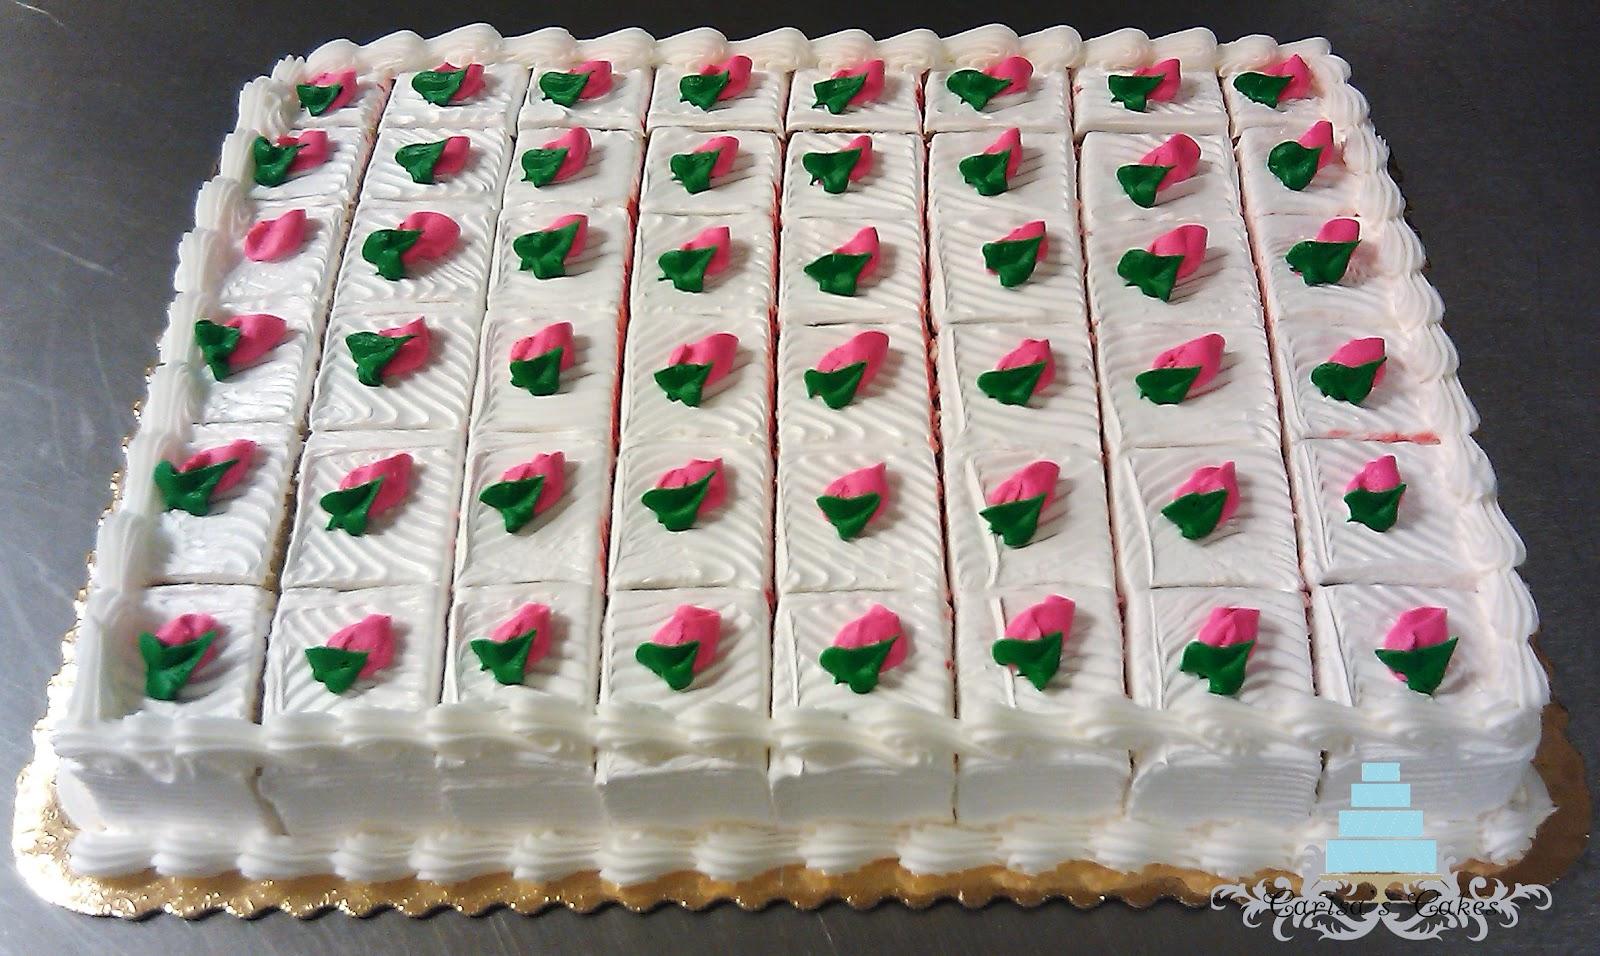 Carisas Cakes Black and White Wedding Cake